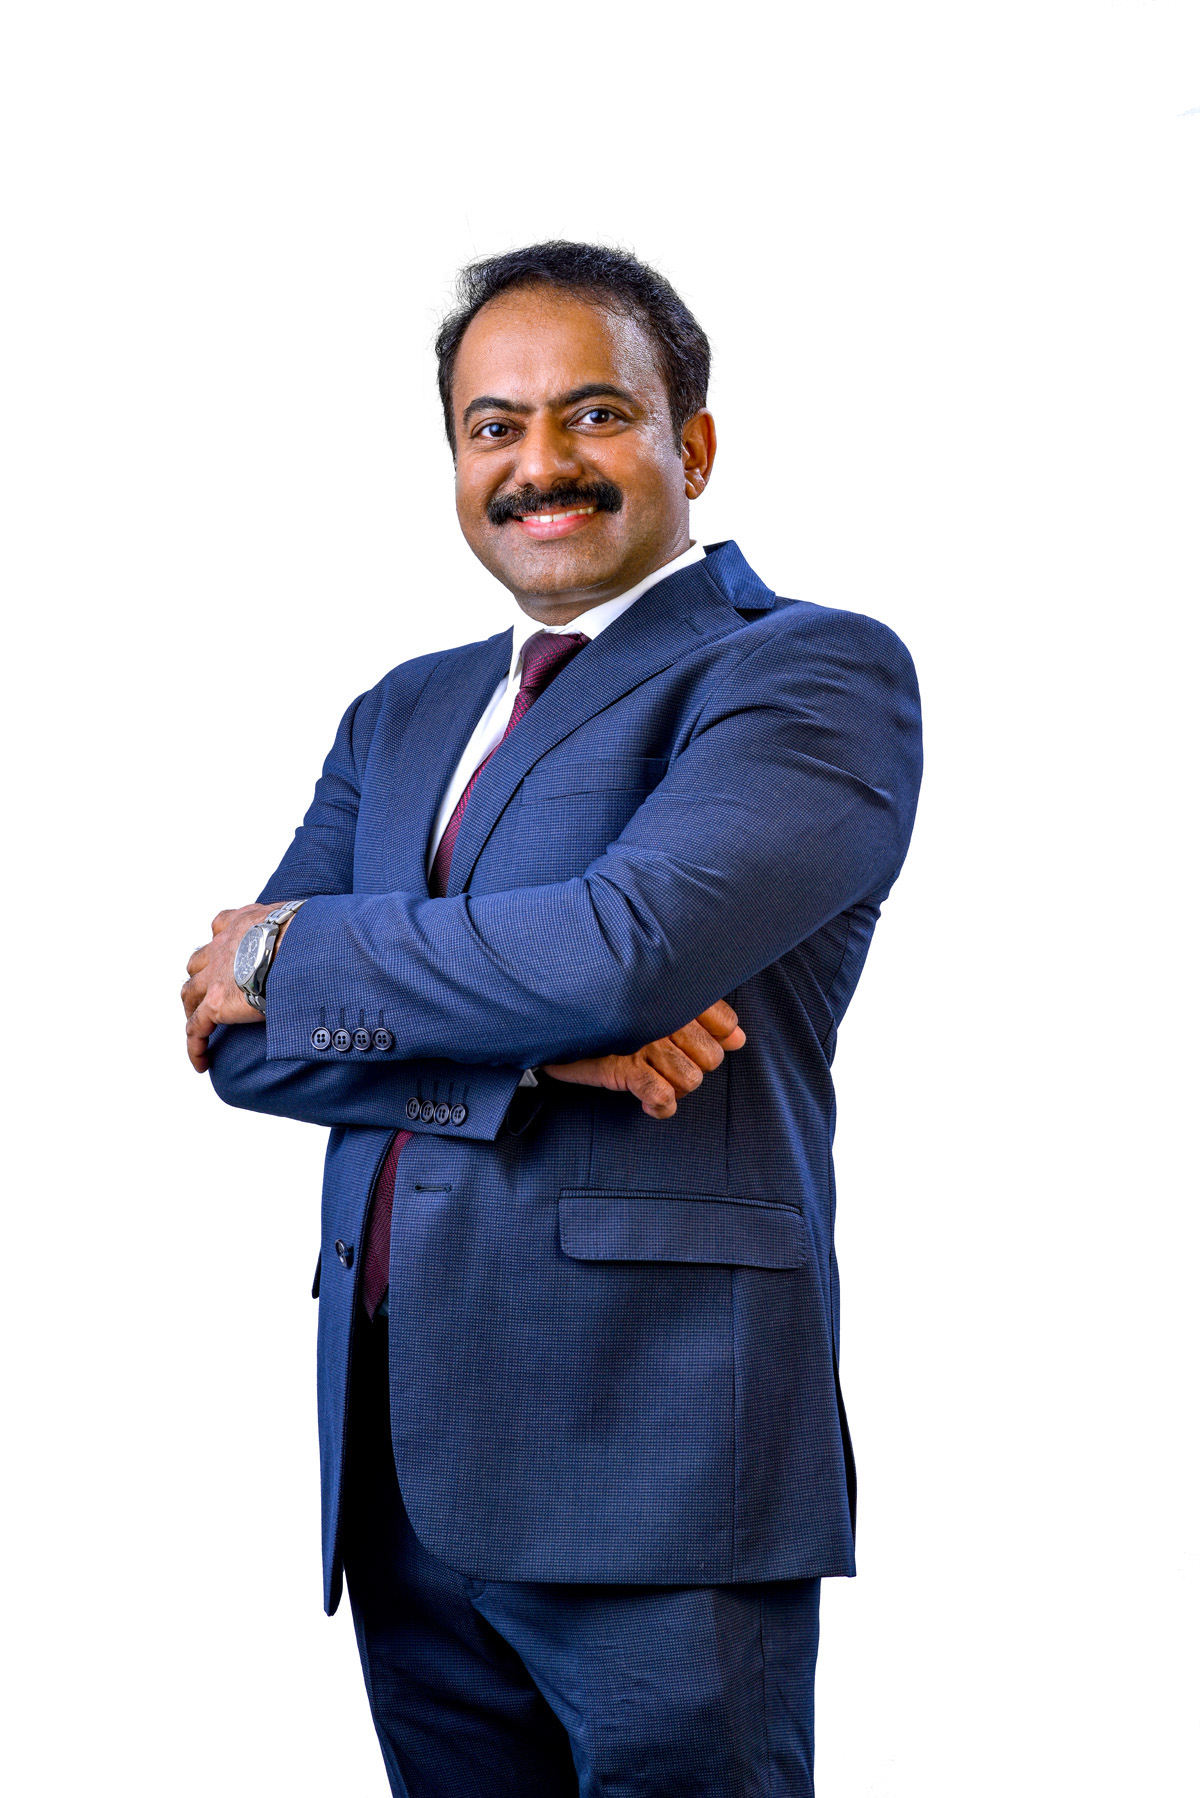 Prof Dr Sujit Jos, Head of Orthopedics, MOSC Hospital and Medical College, Ernakulam